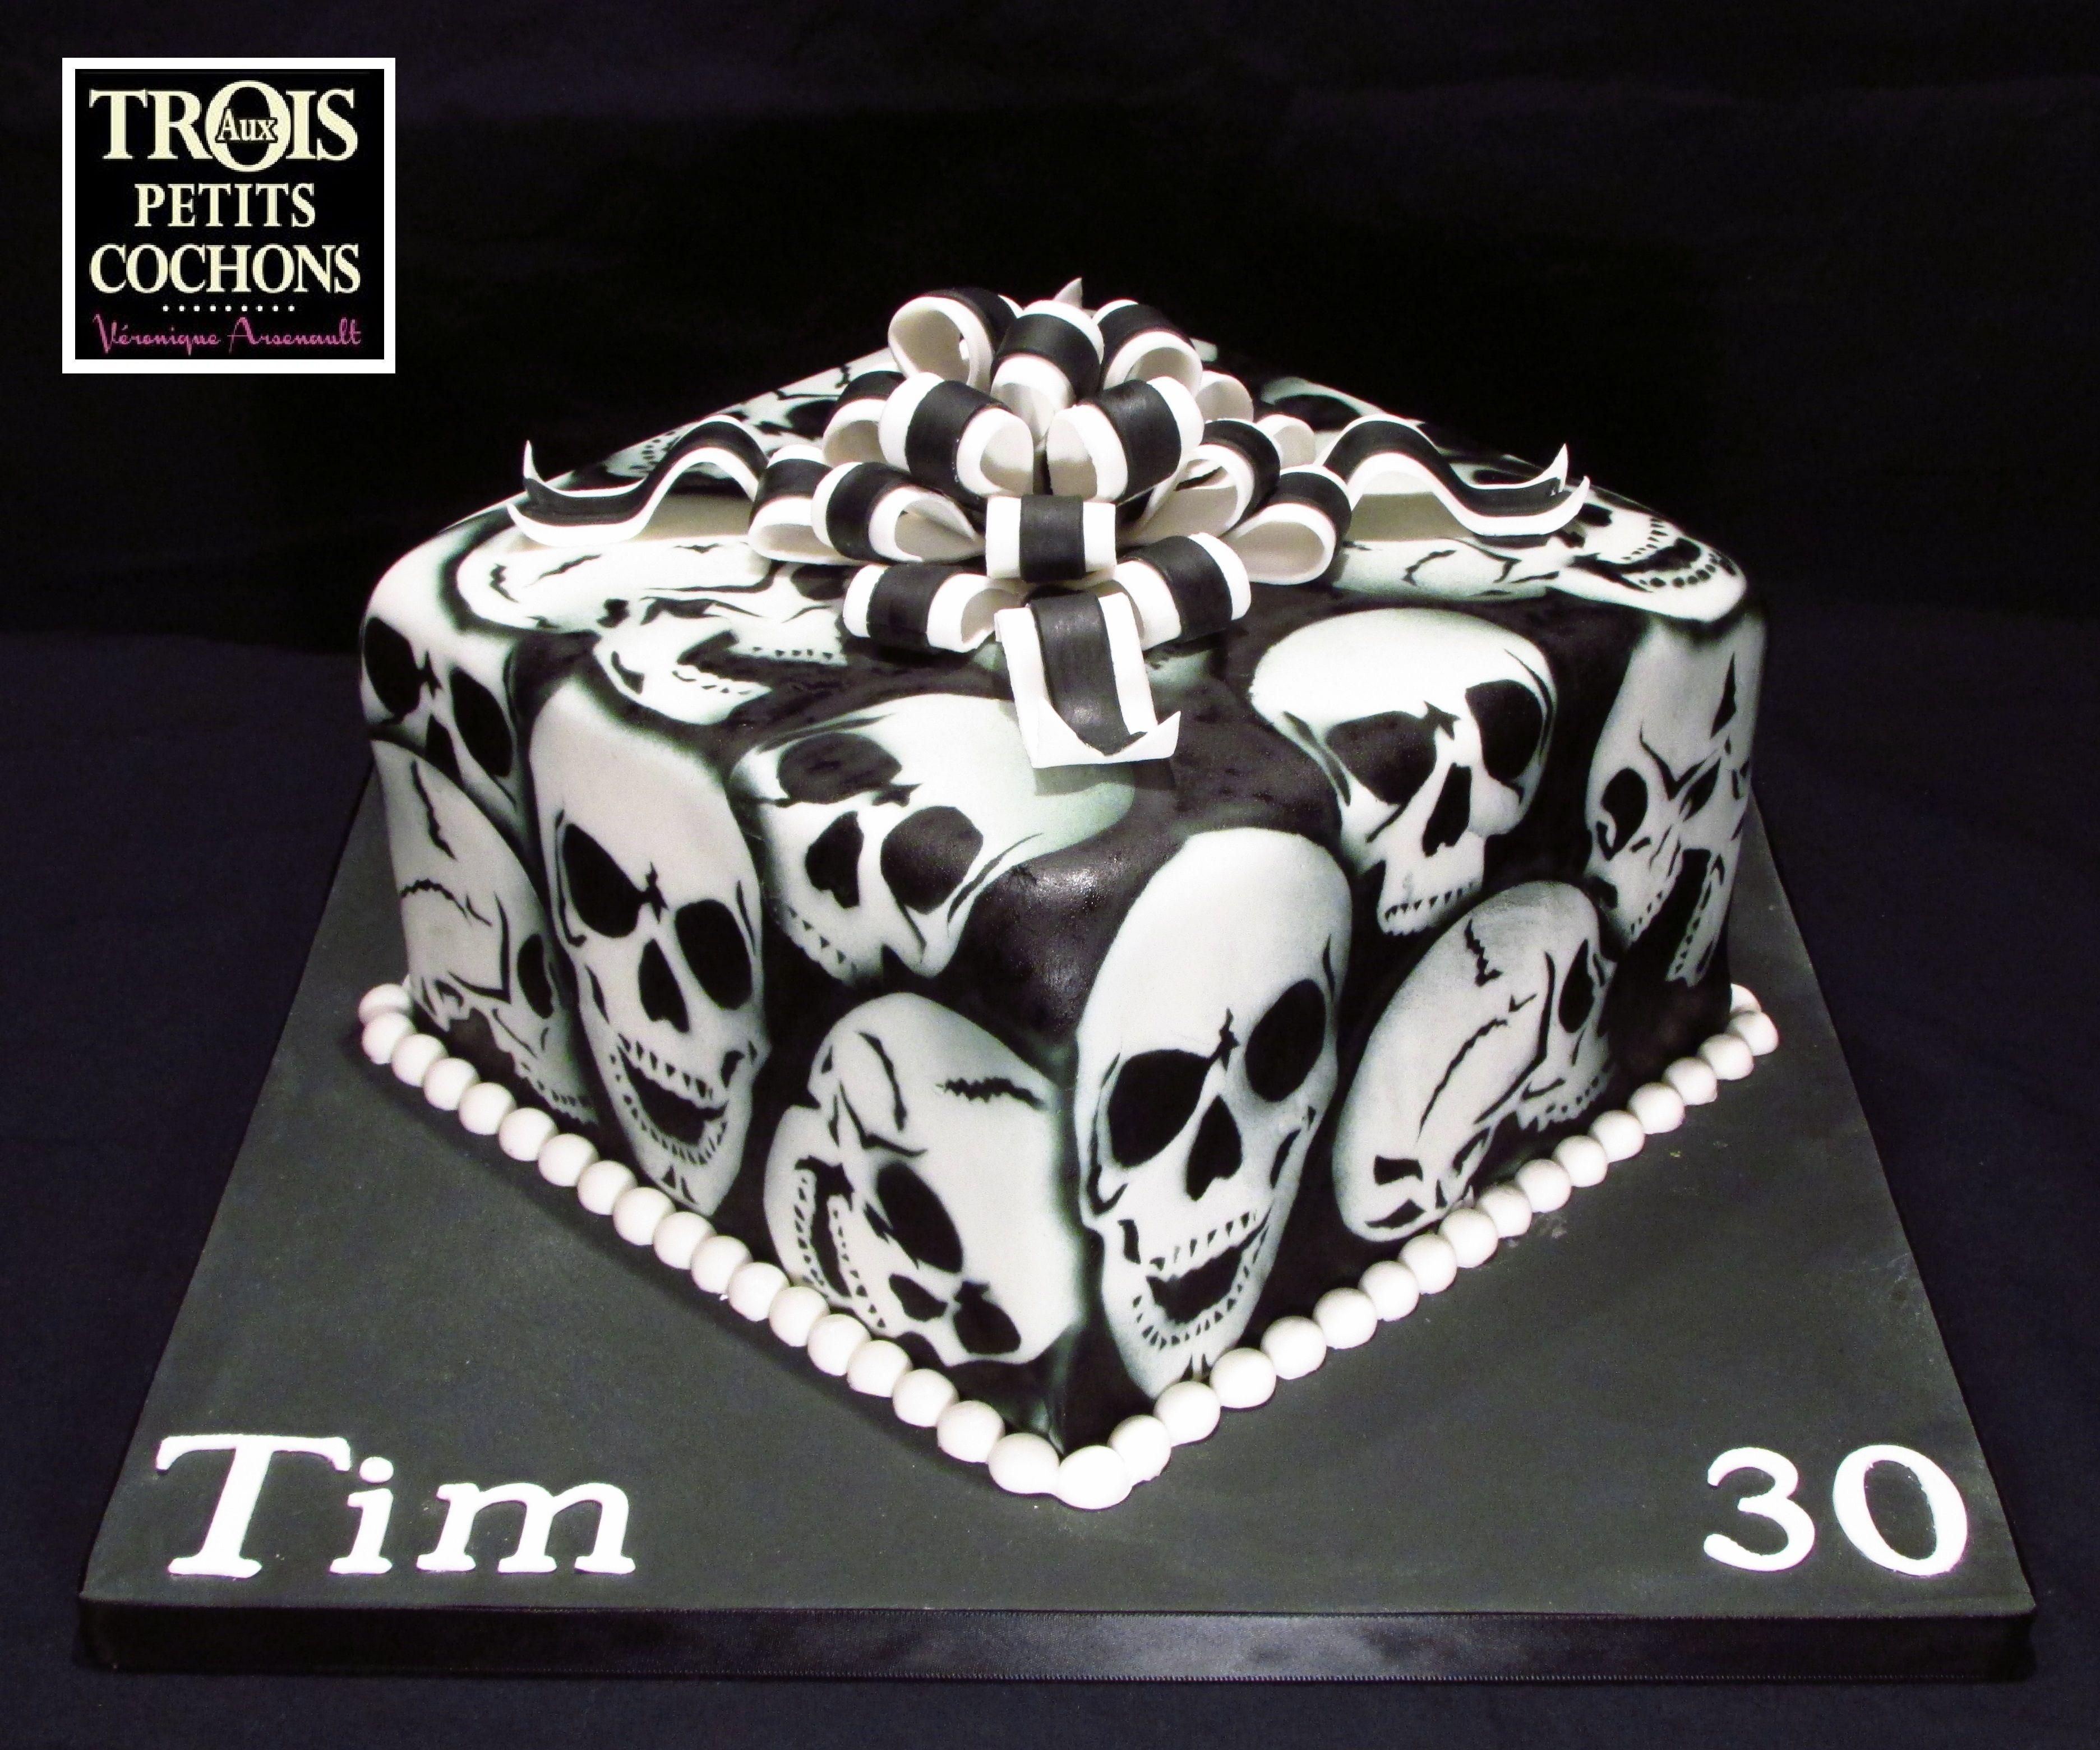 Sensational Happy Birthday Tim Skull Cake Gothic Birthday Cakes Cupcake Cakes Funny Birthday Cards Online Eattedamsfinfo